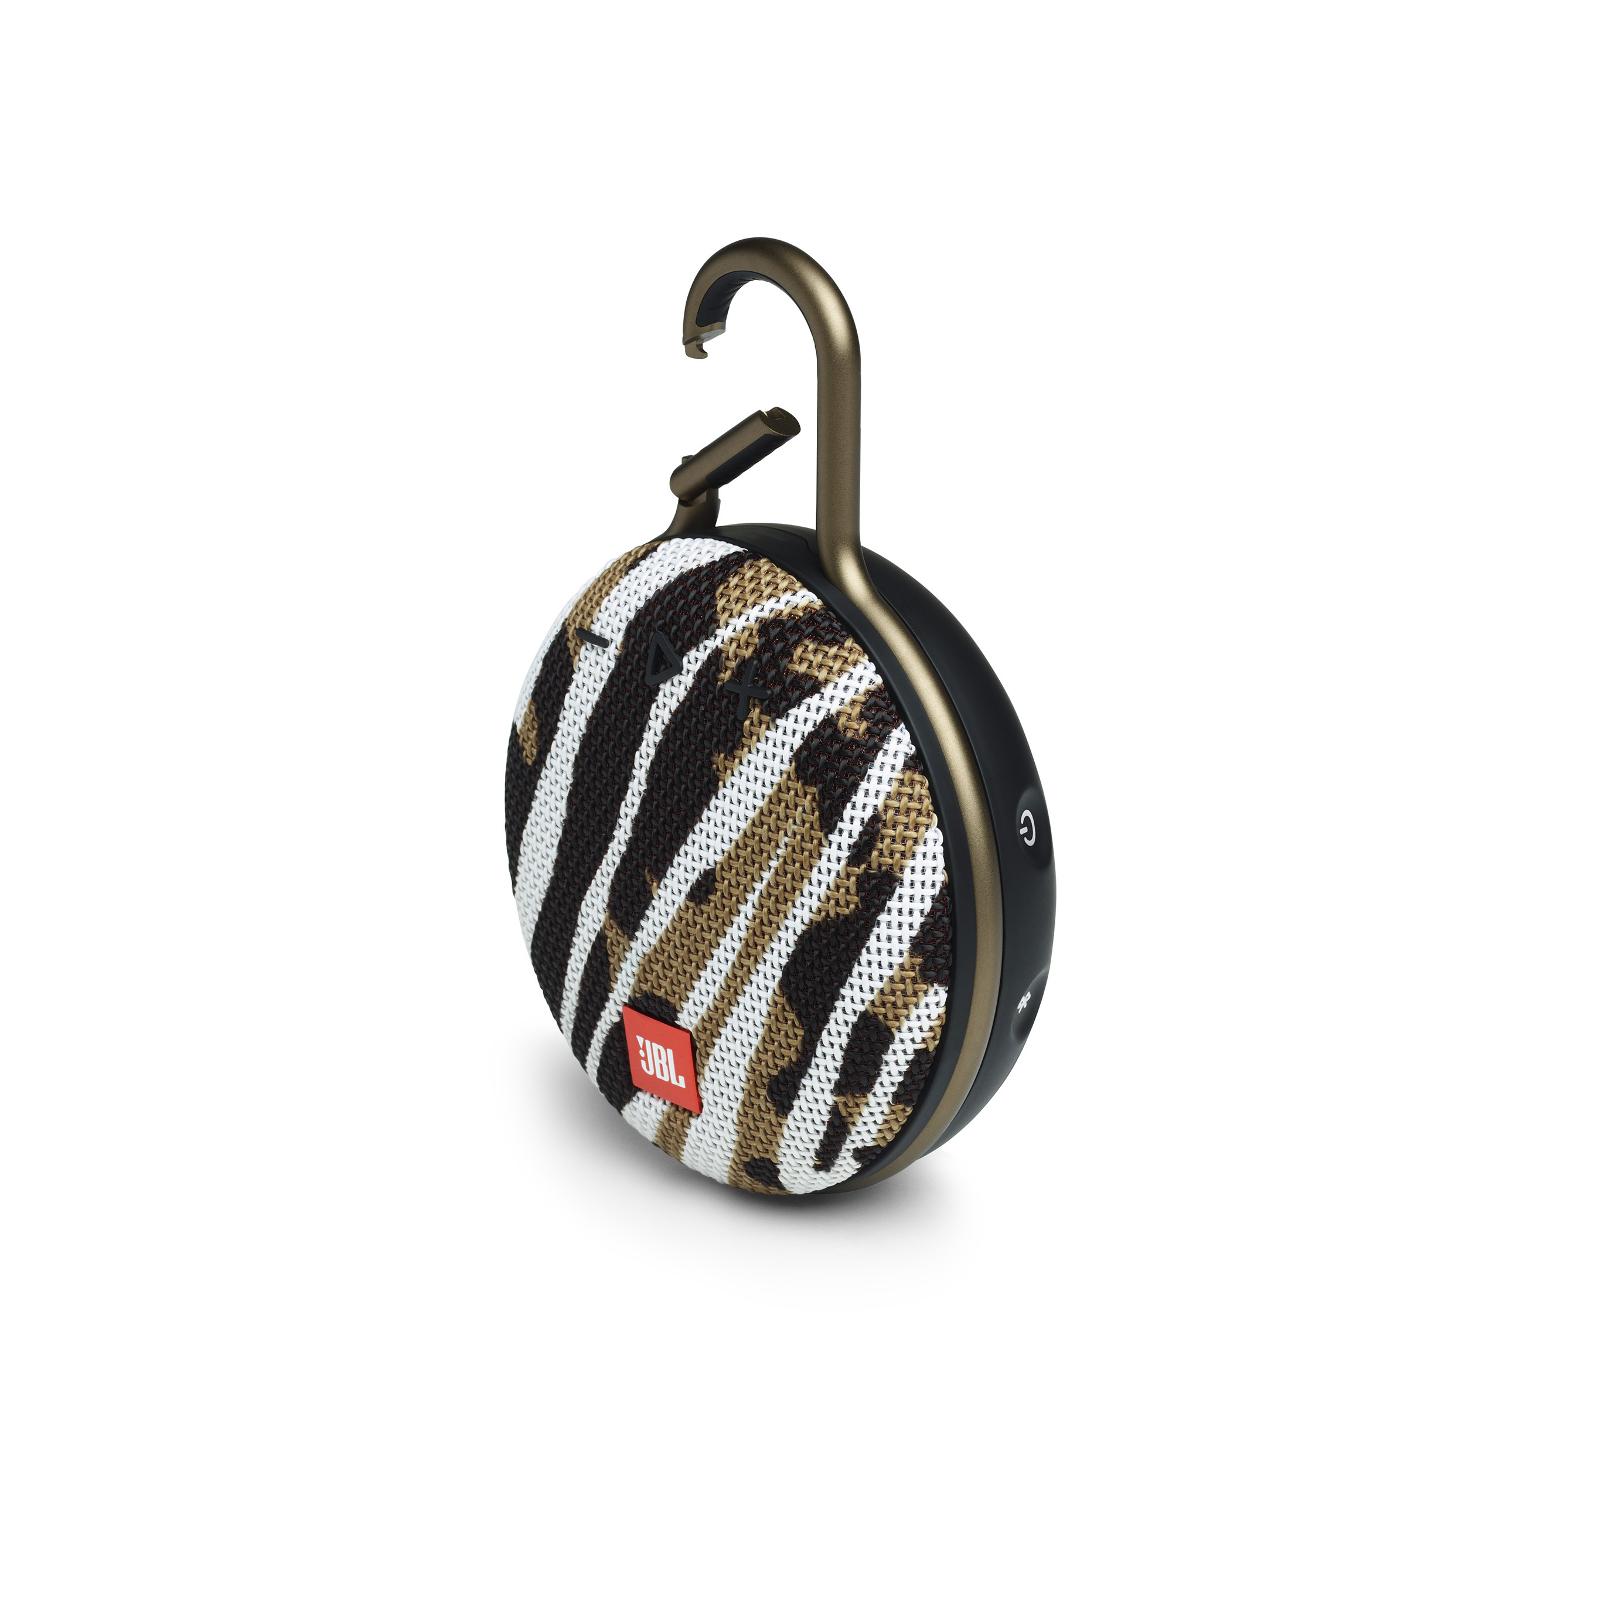 JBL CLIP 3 - BlackWhite/Brown Camo - Portable Bluetooth® speaker - Detailshot 2